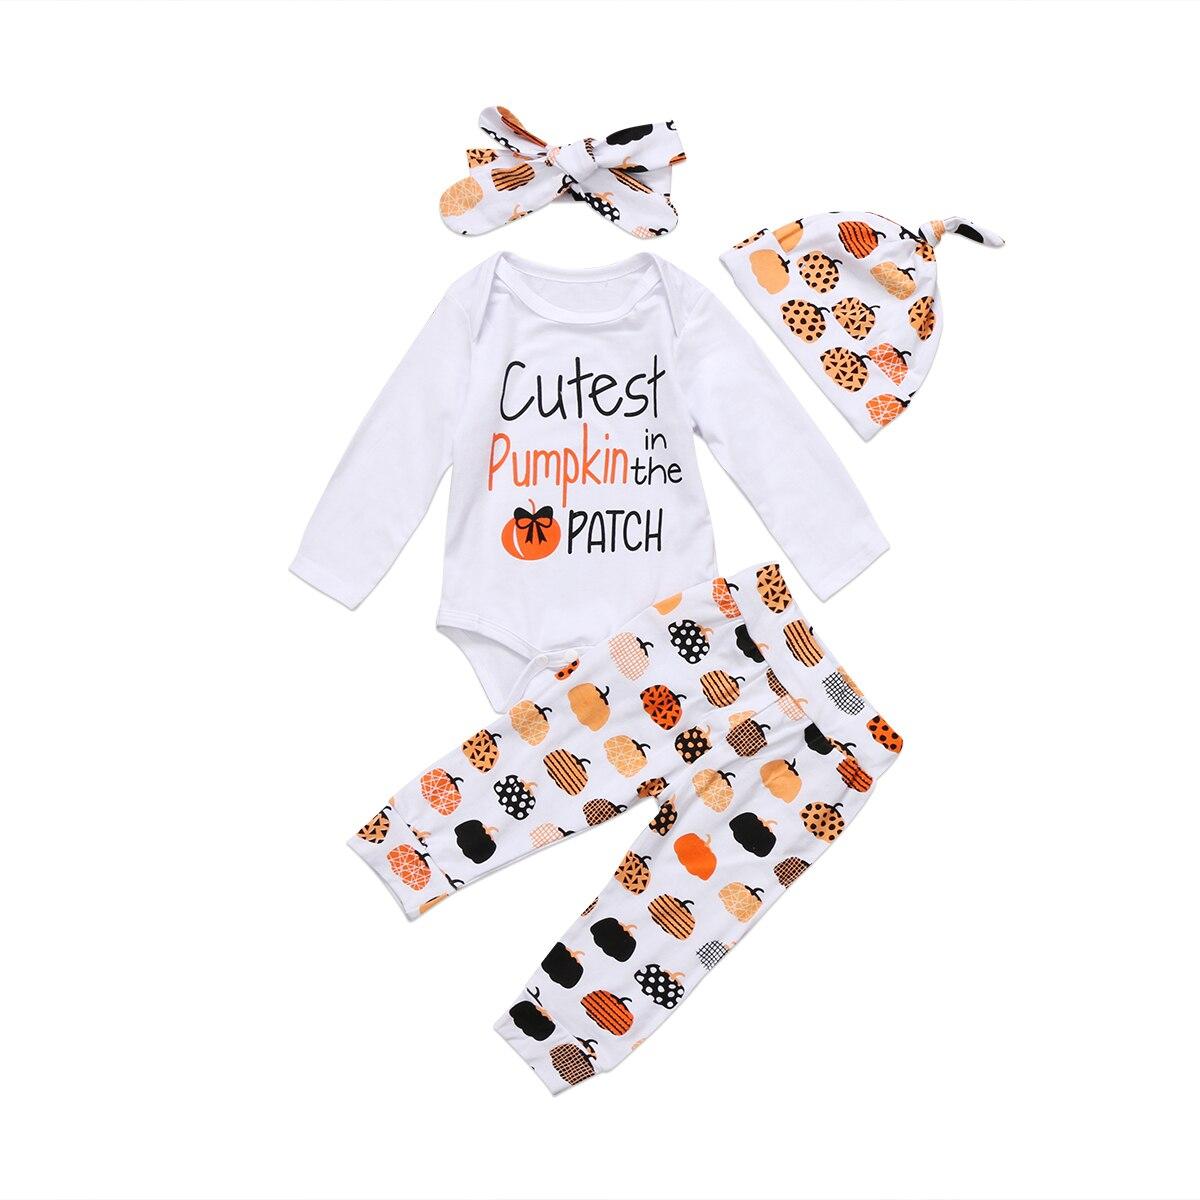 4Pcs Set Halloween Newborn Toddler Baby Boys Girls Pumpkin Tops Romper Legging Pants Hat Headbands Outfits Suit Clothes